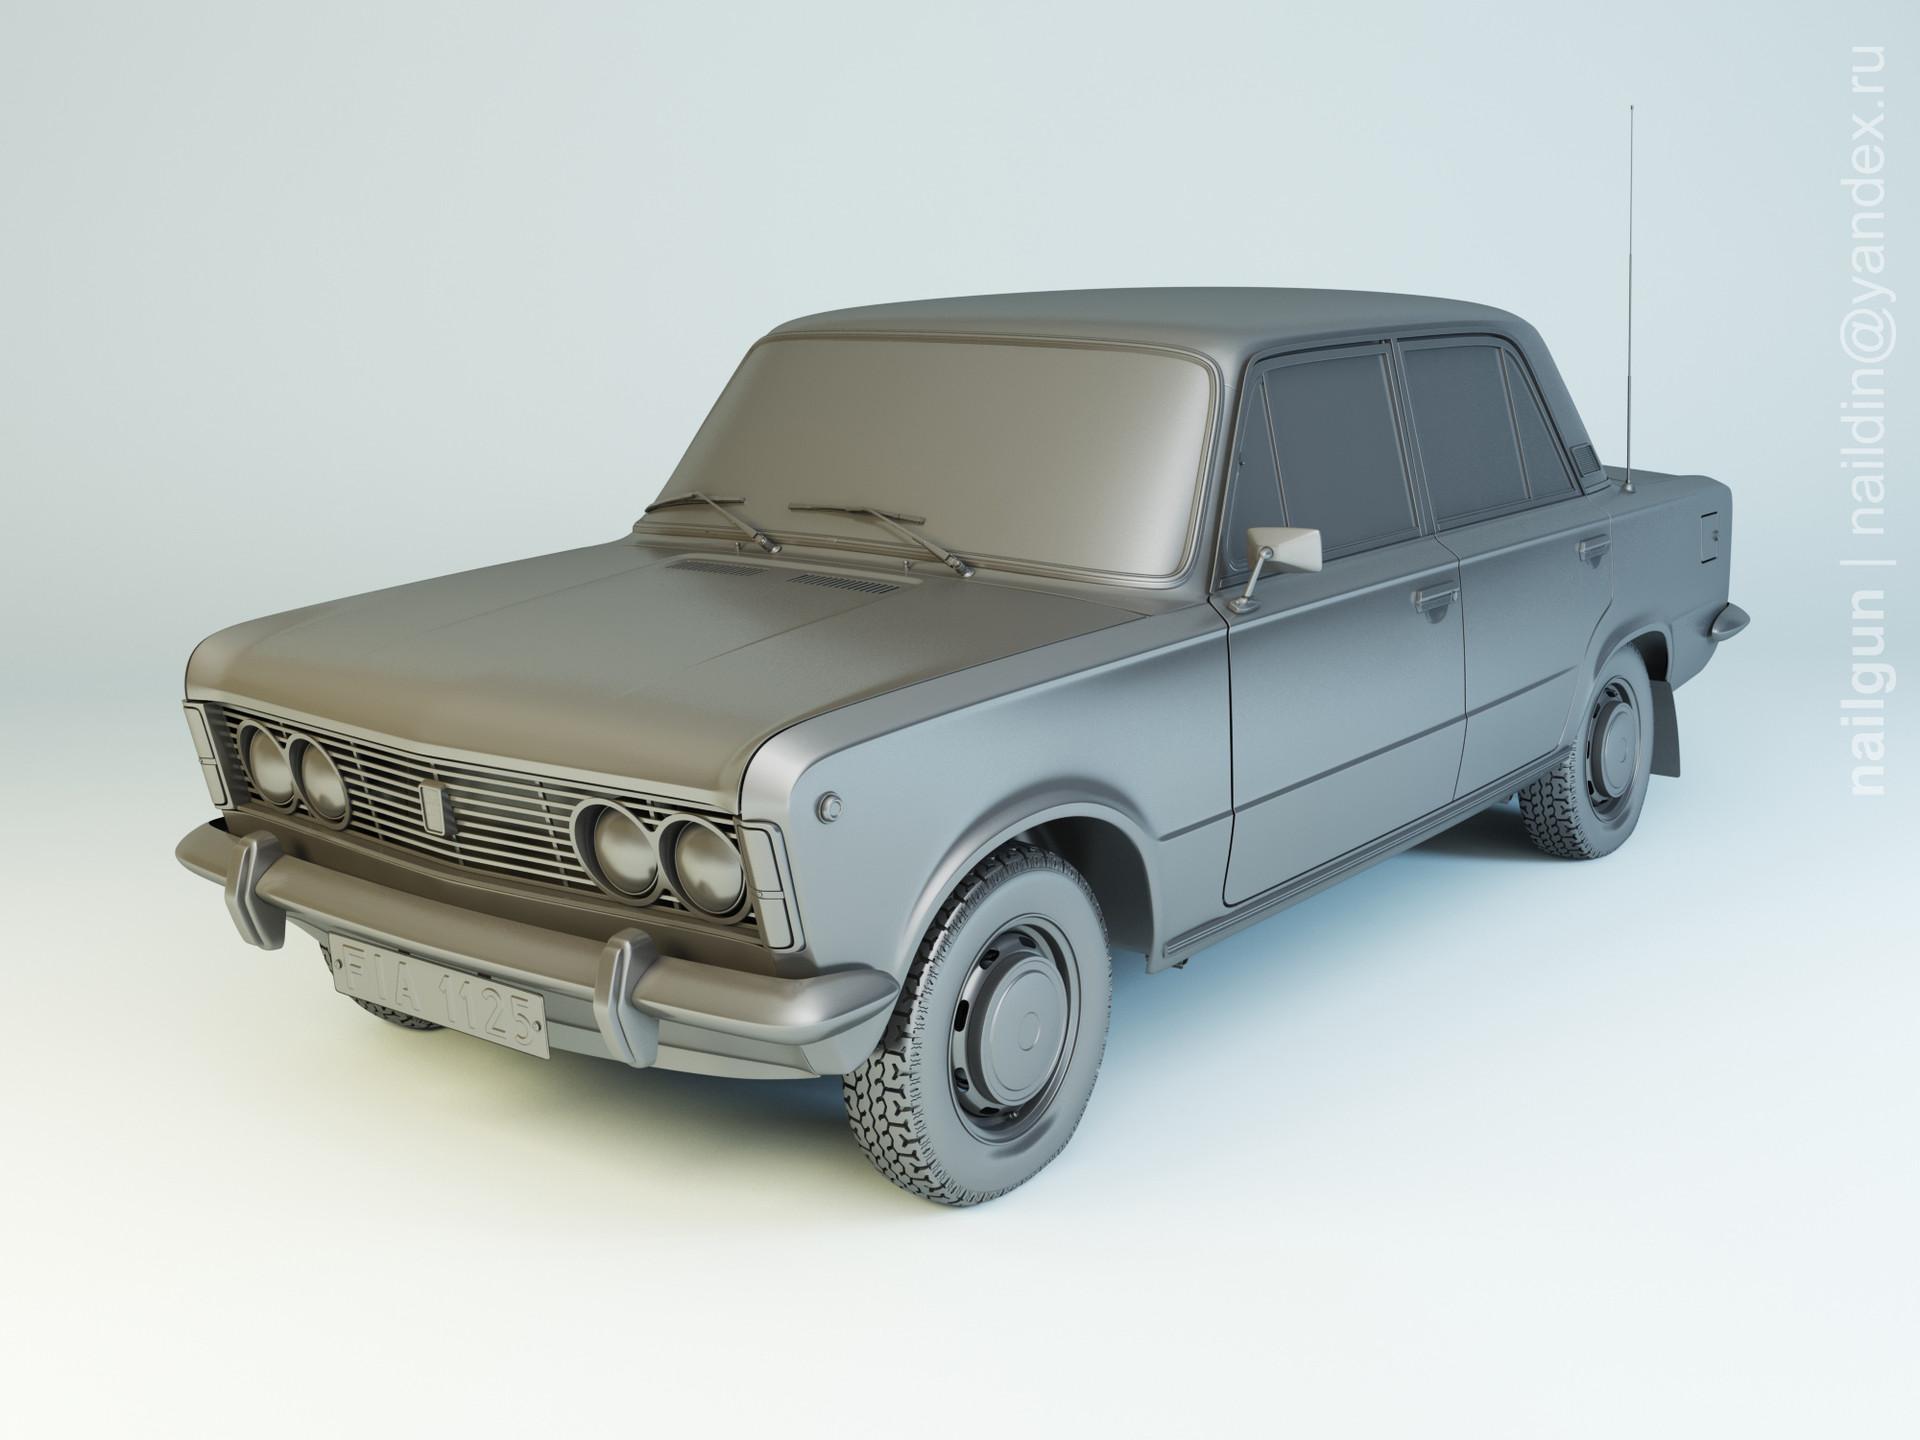 Nail khusnutdinov als 165 001 fiat 125p modelling 0